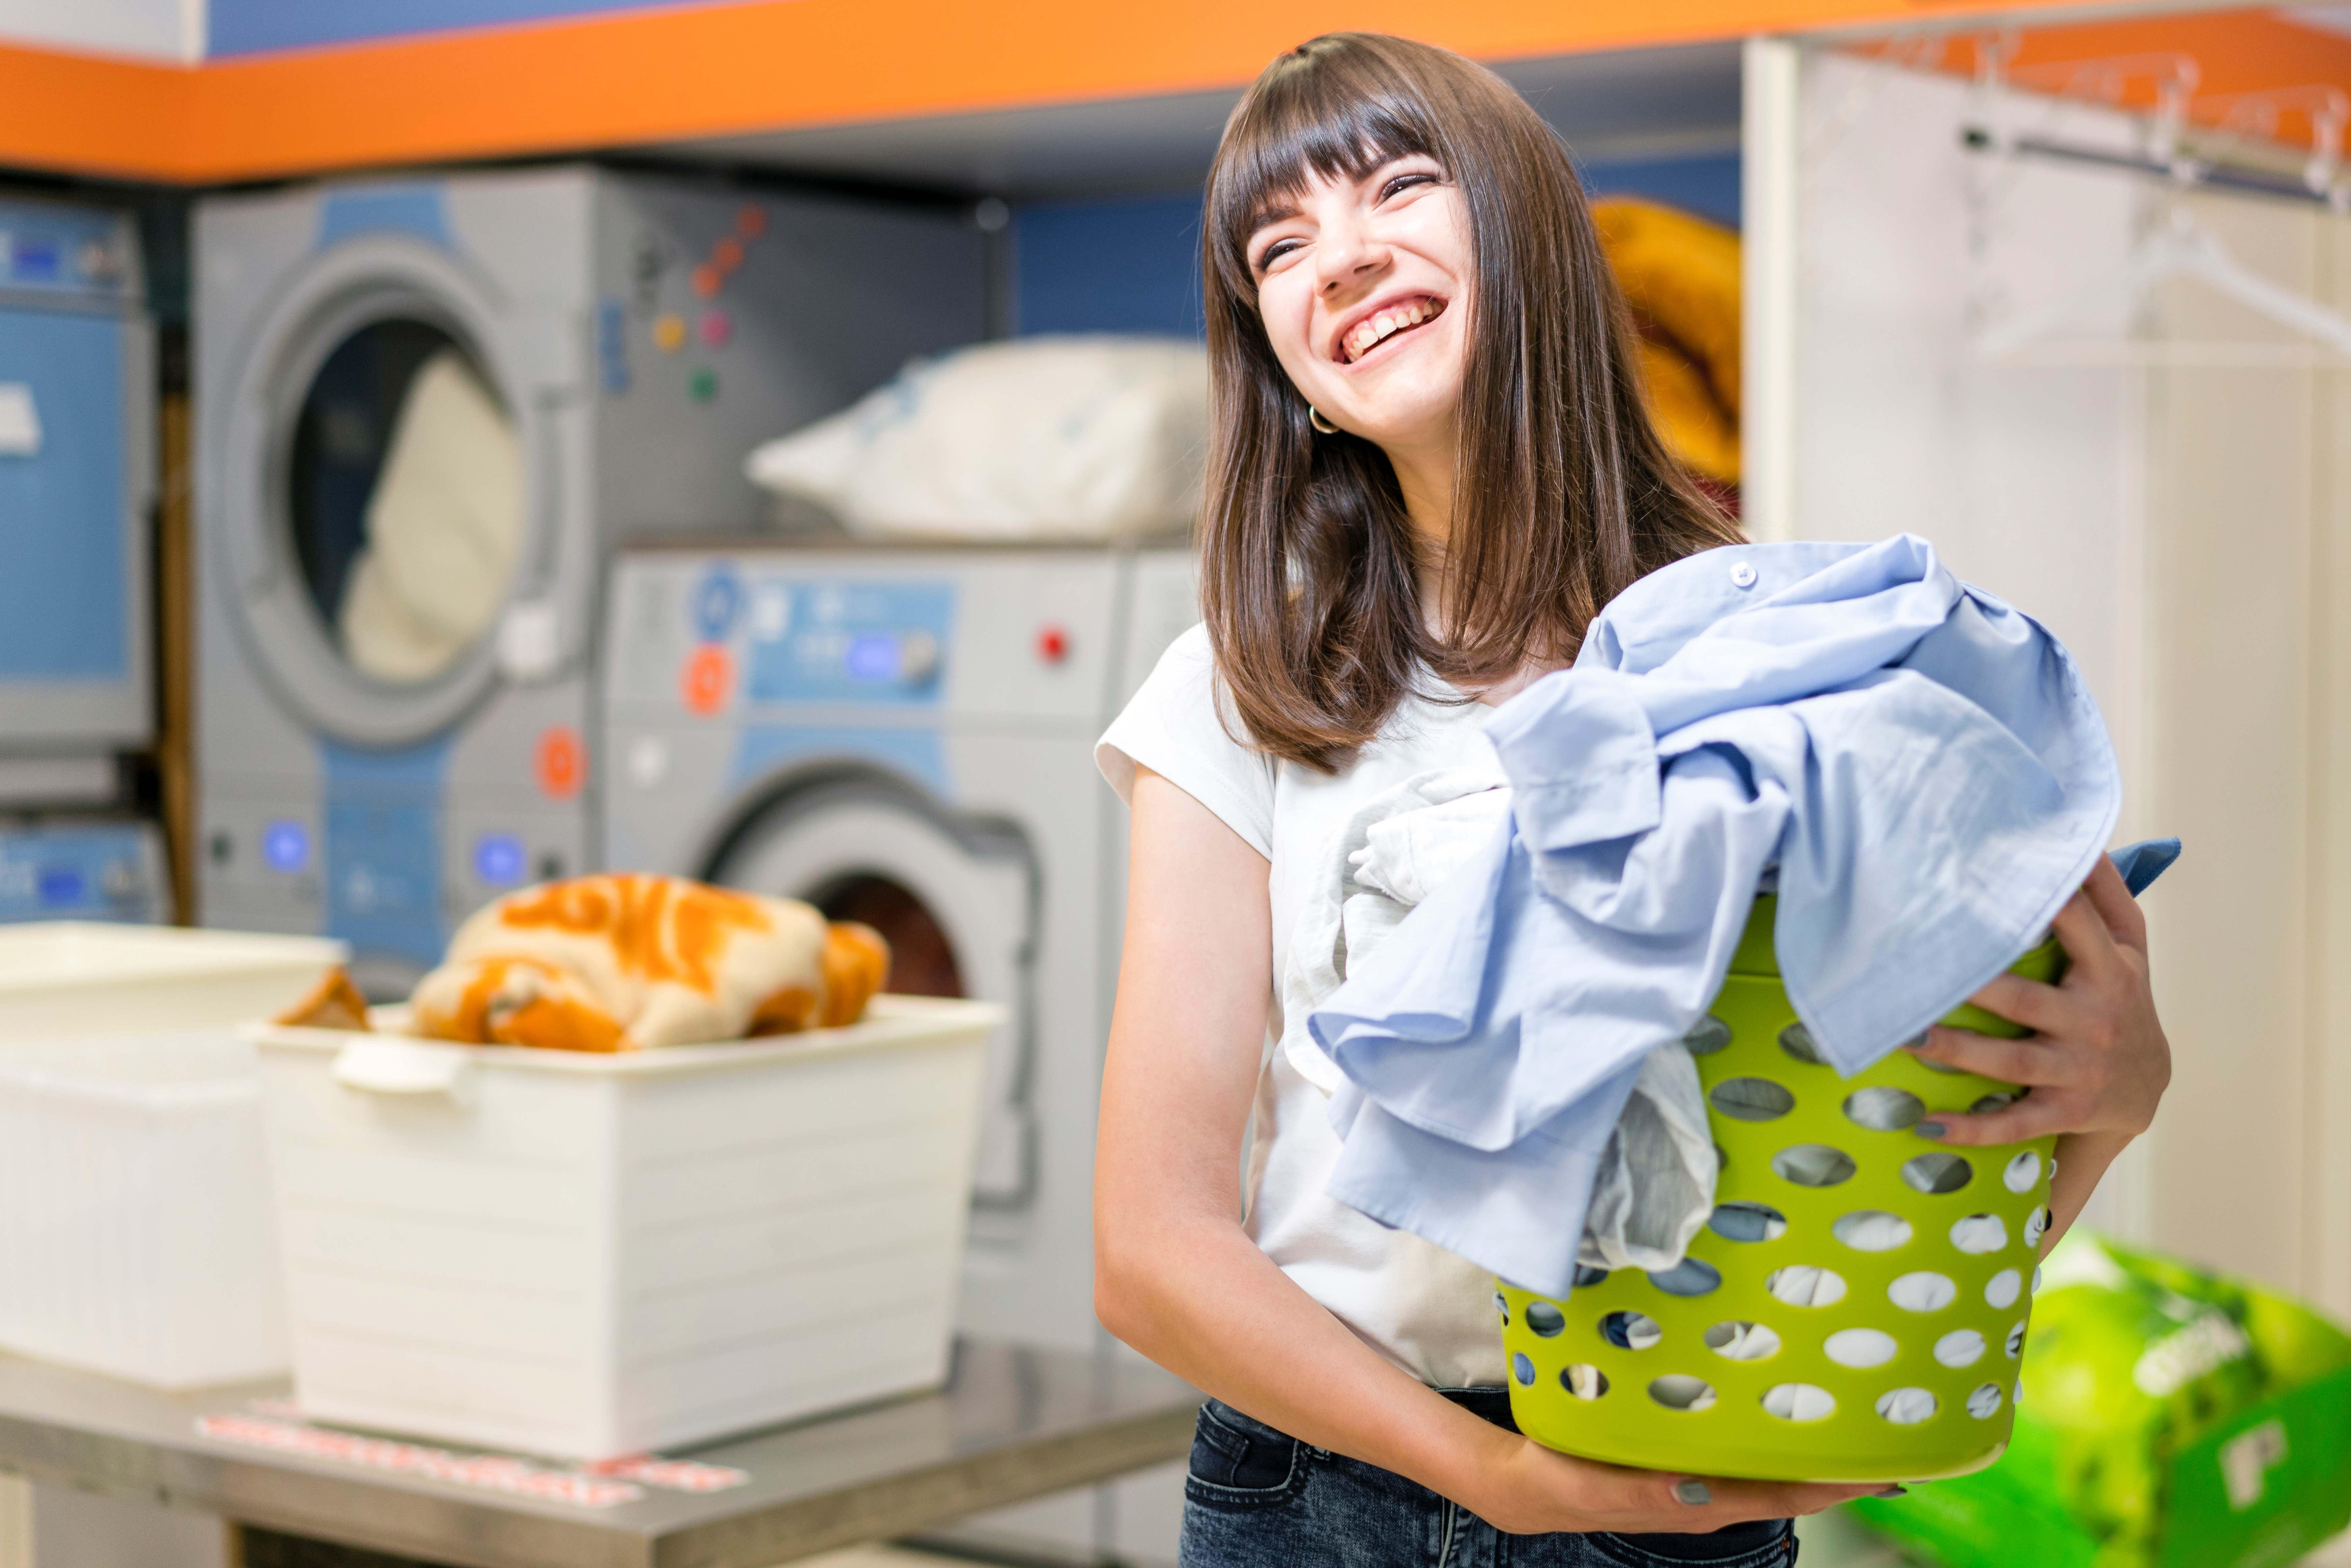 como lavar a roupa interior feminina